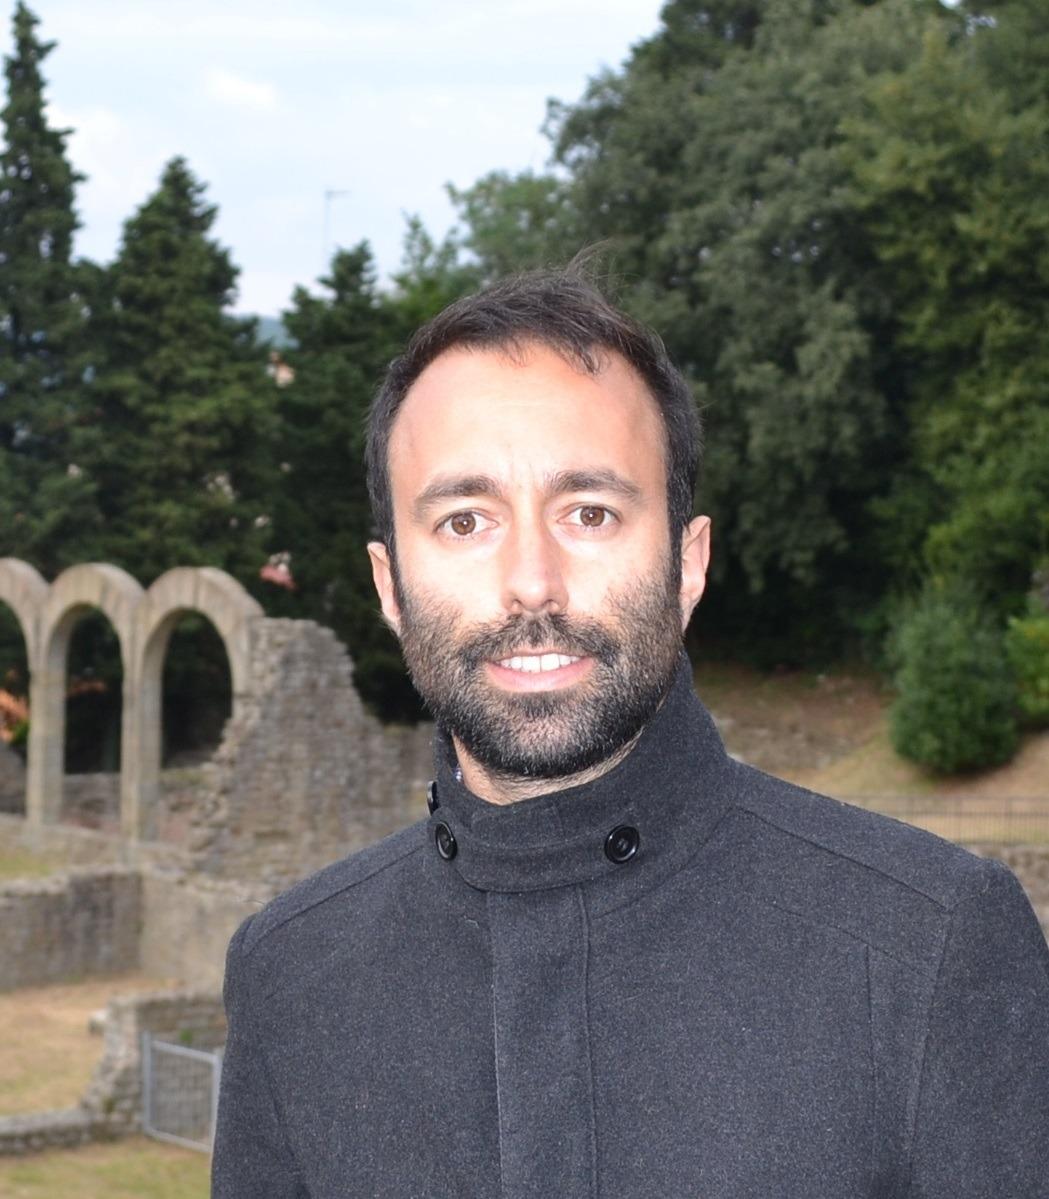 Germán Bidegain